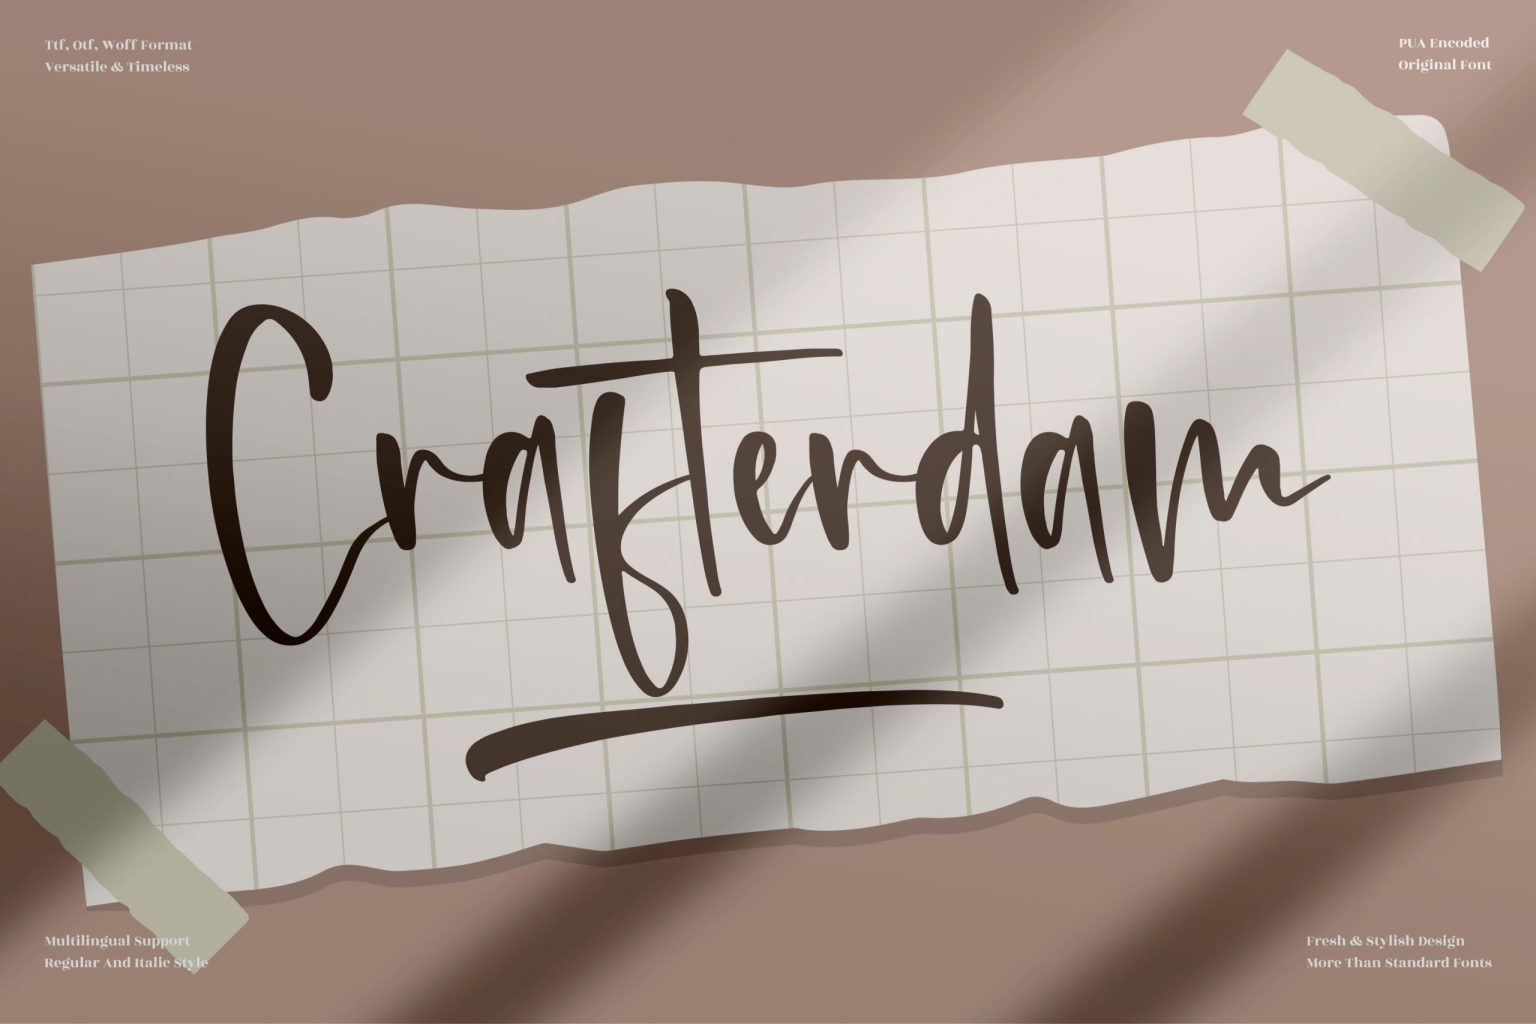 Crafterdam Calligraphy Font